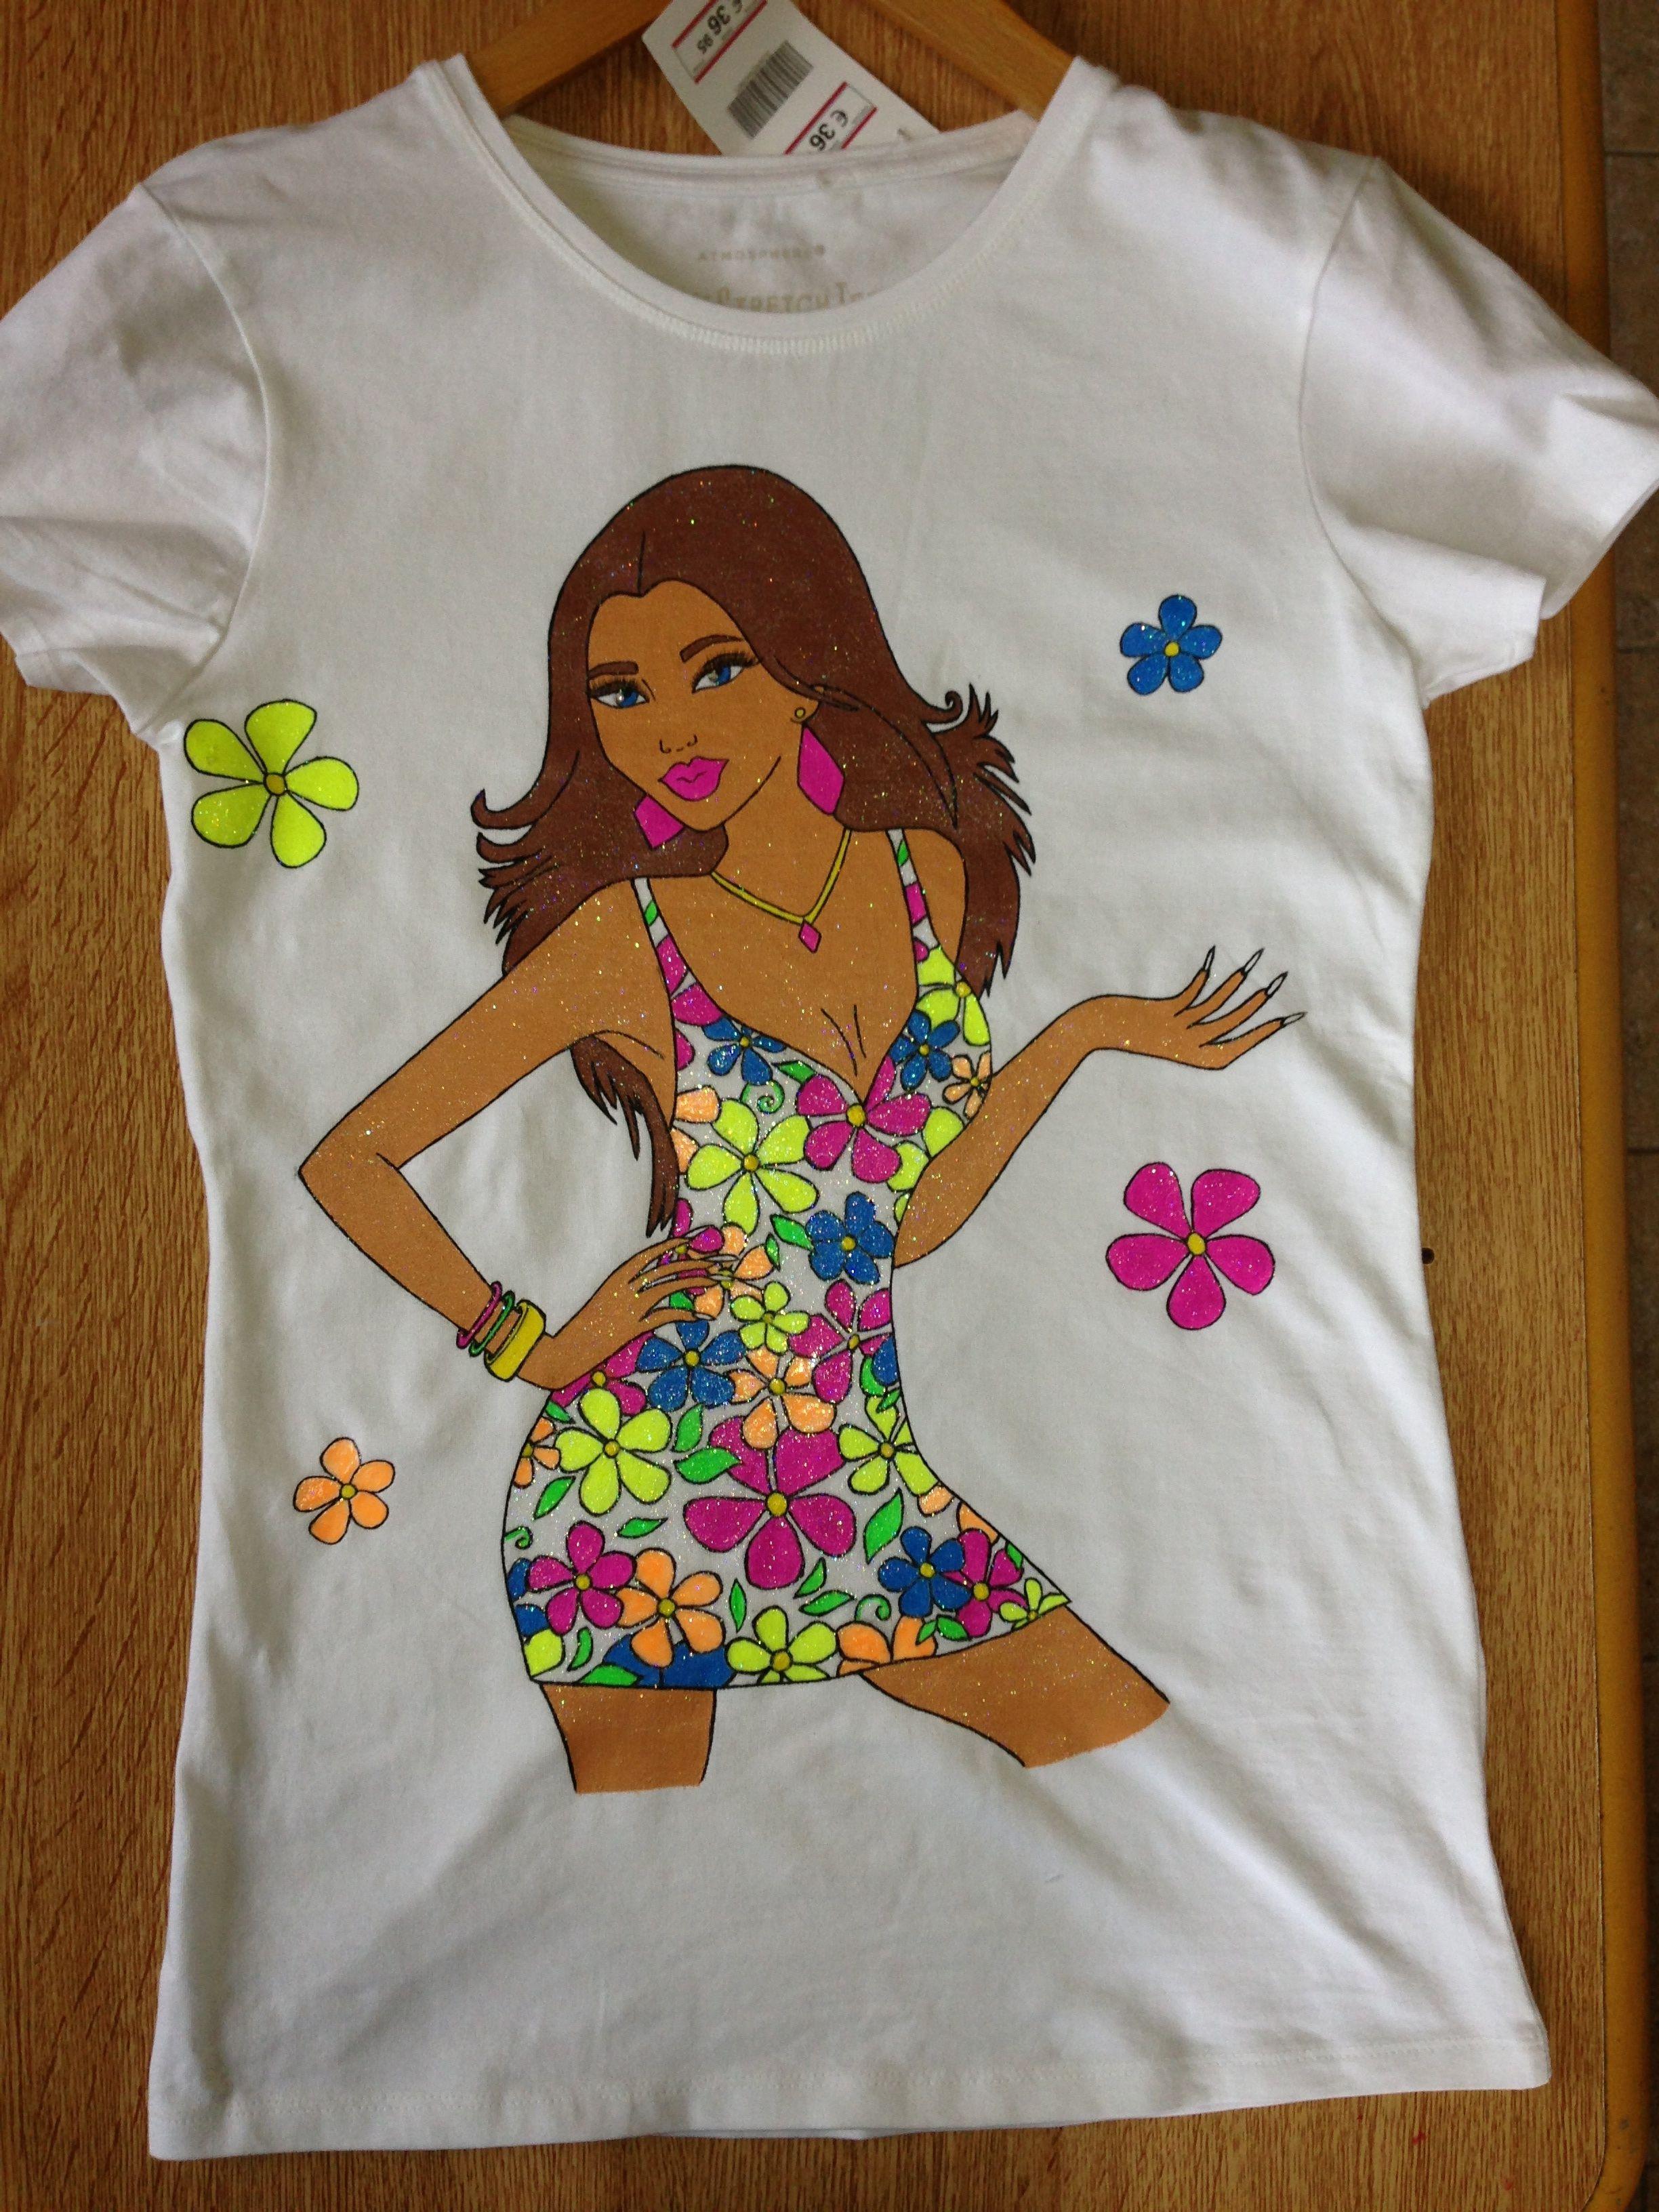 T-shirt design handmade - T Shirt Design Handmade